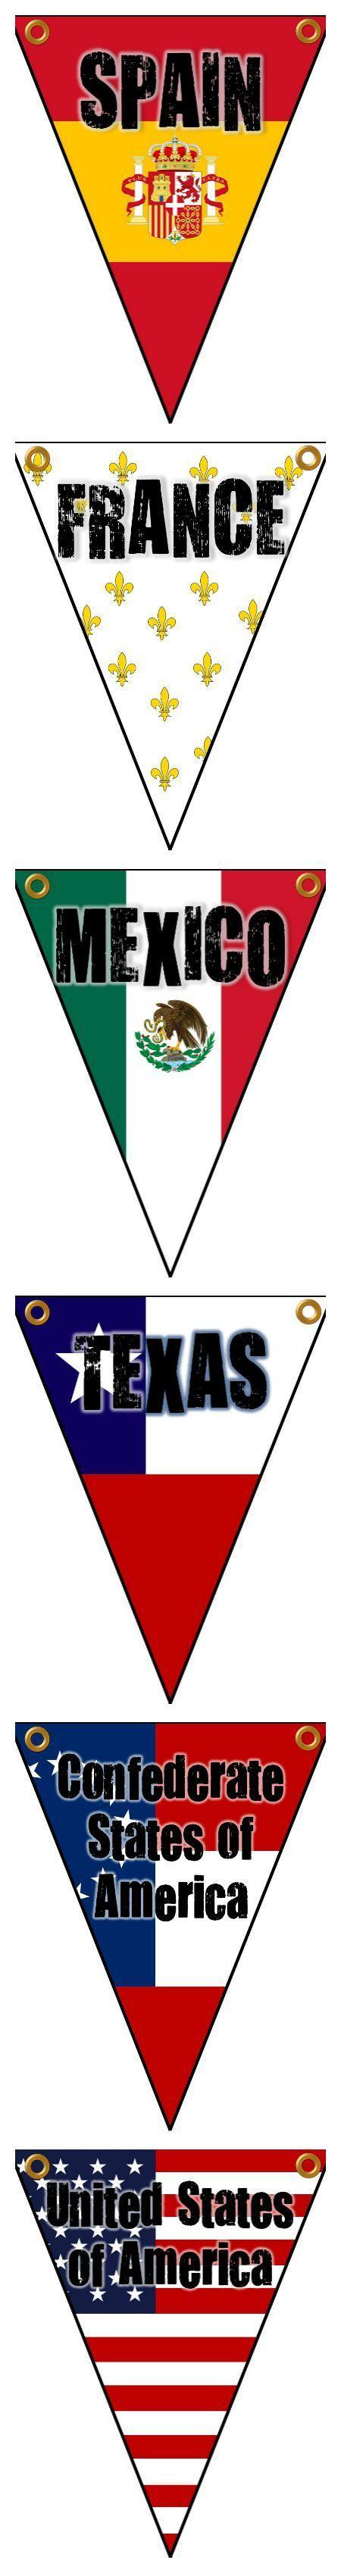 Six Flags Over Texas Banner Texas History Classroom History Classroom History Classroom Decorations